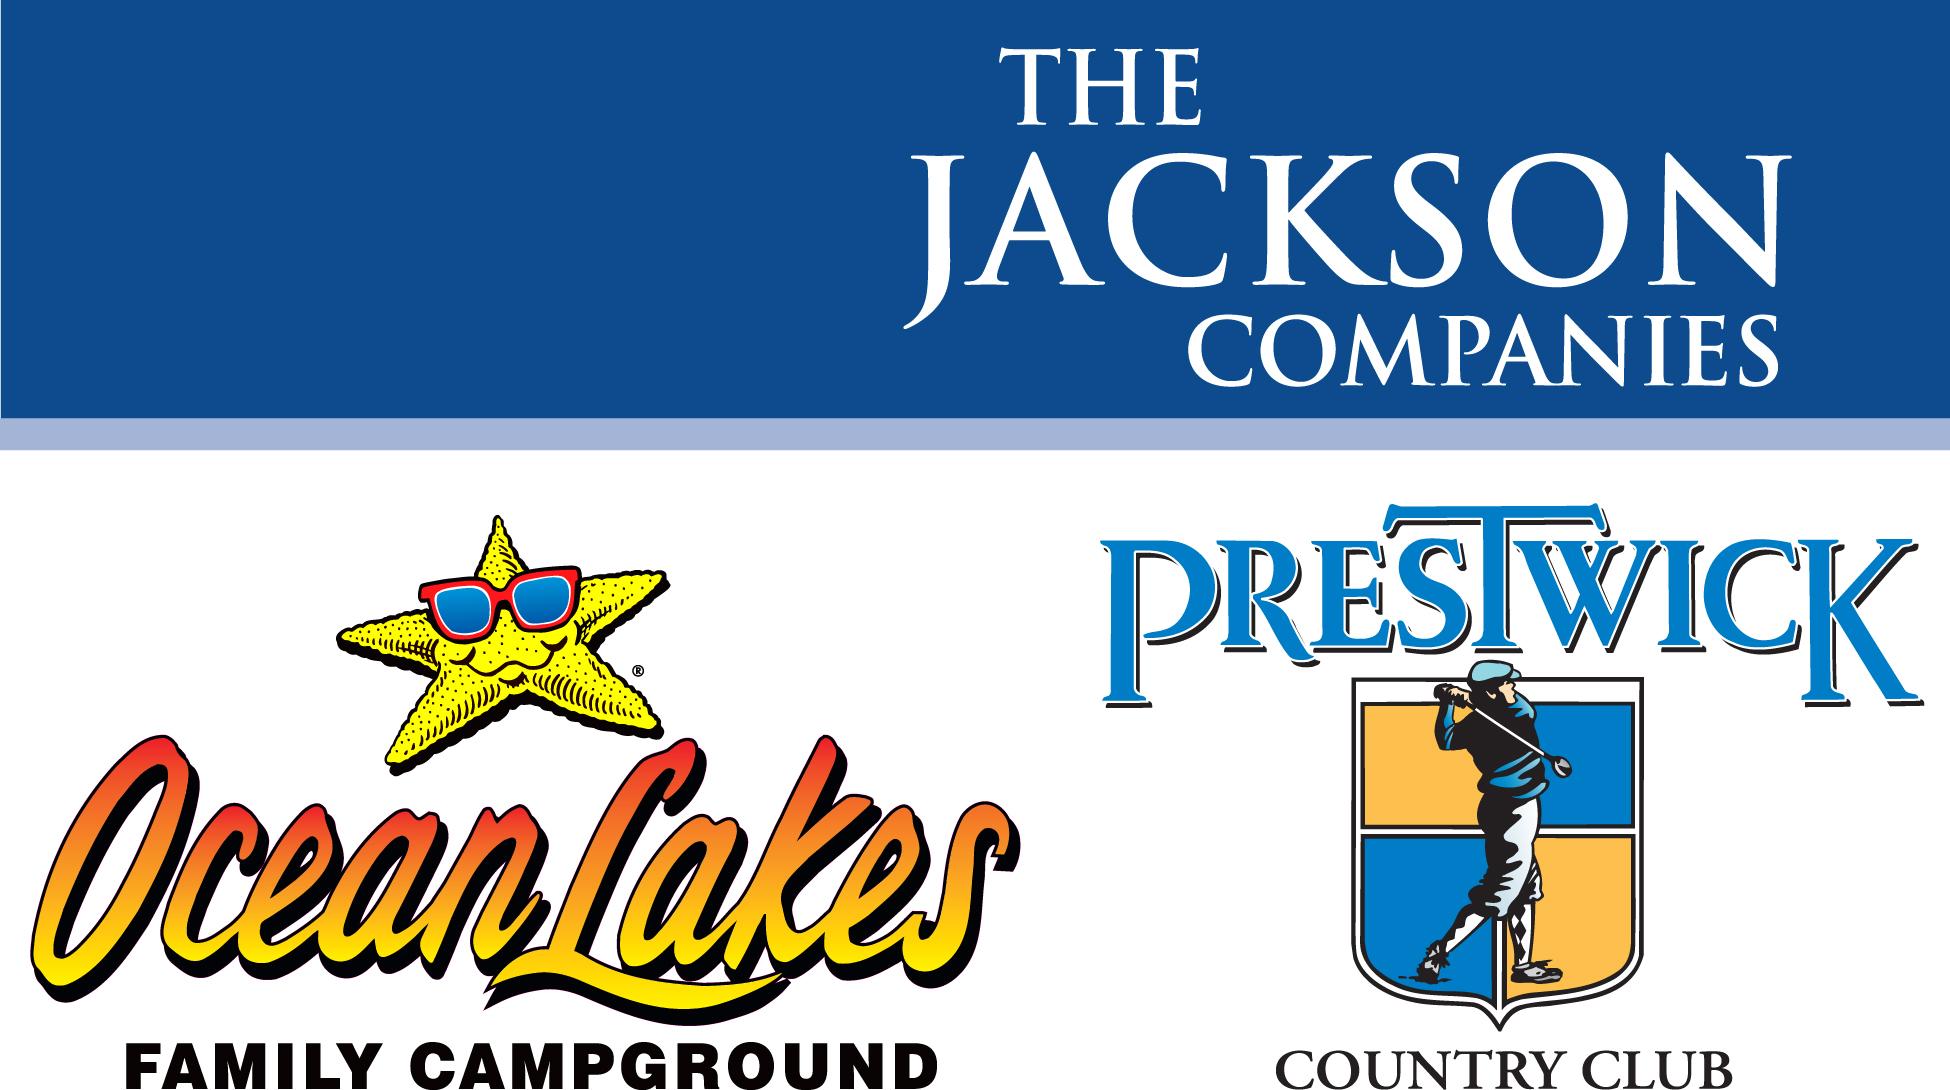 The Jackson Companies 3 Logos vector (1).jpg